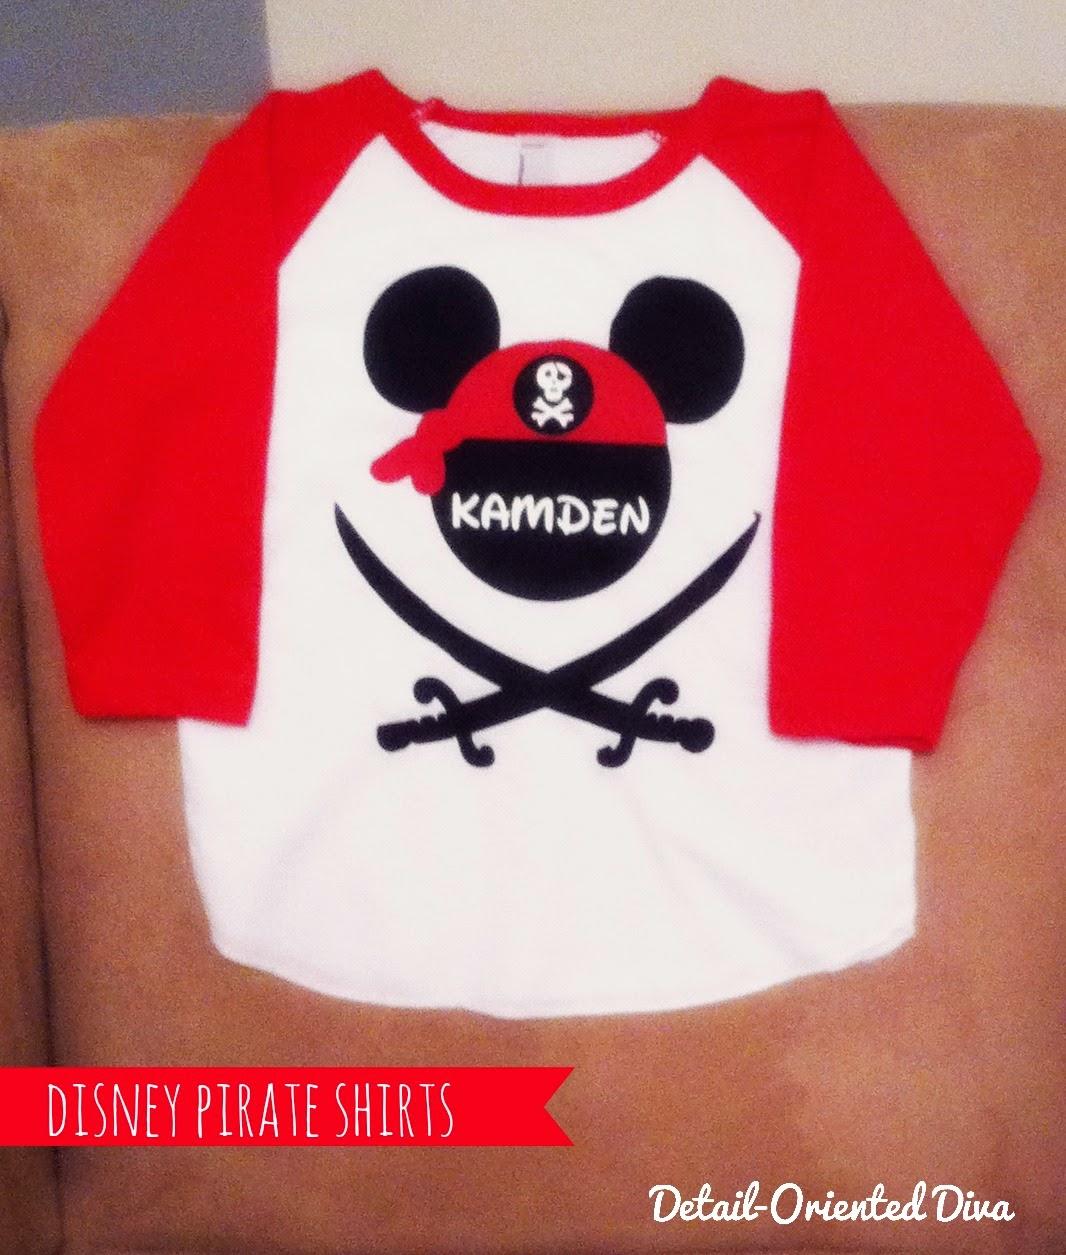 detail oriented diva disney pirate shirts